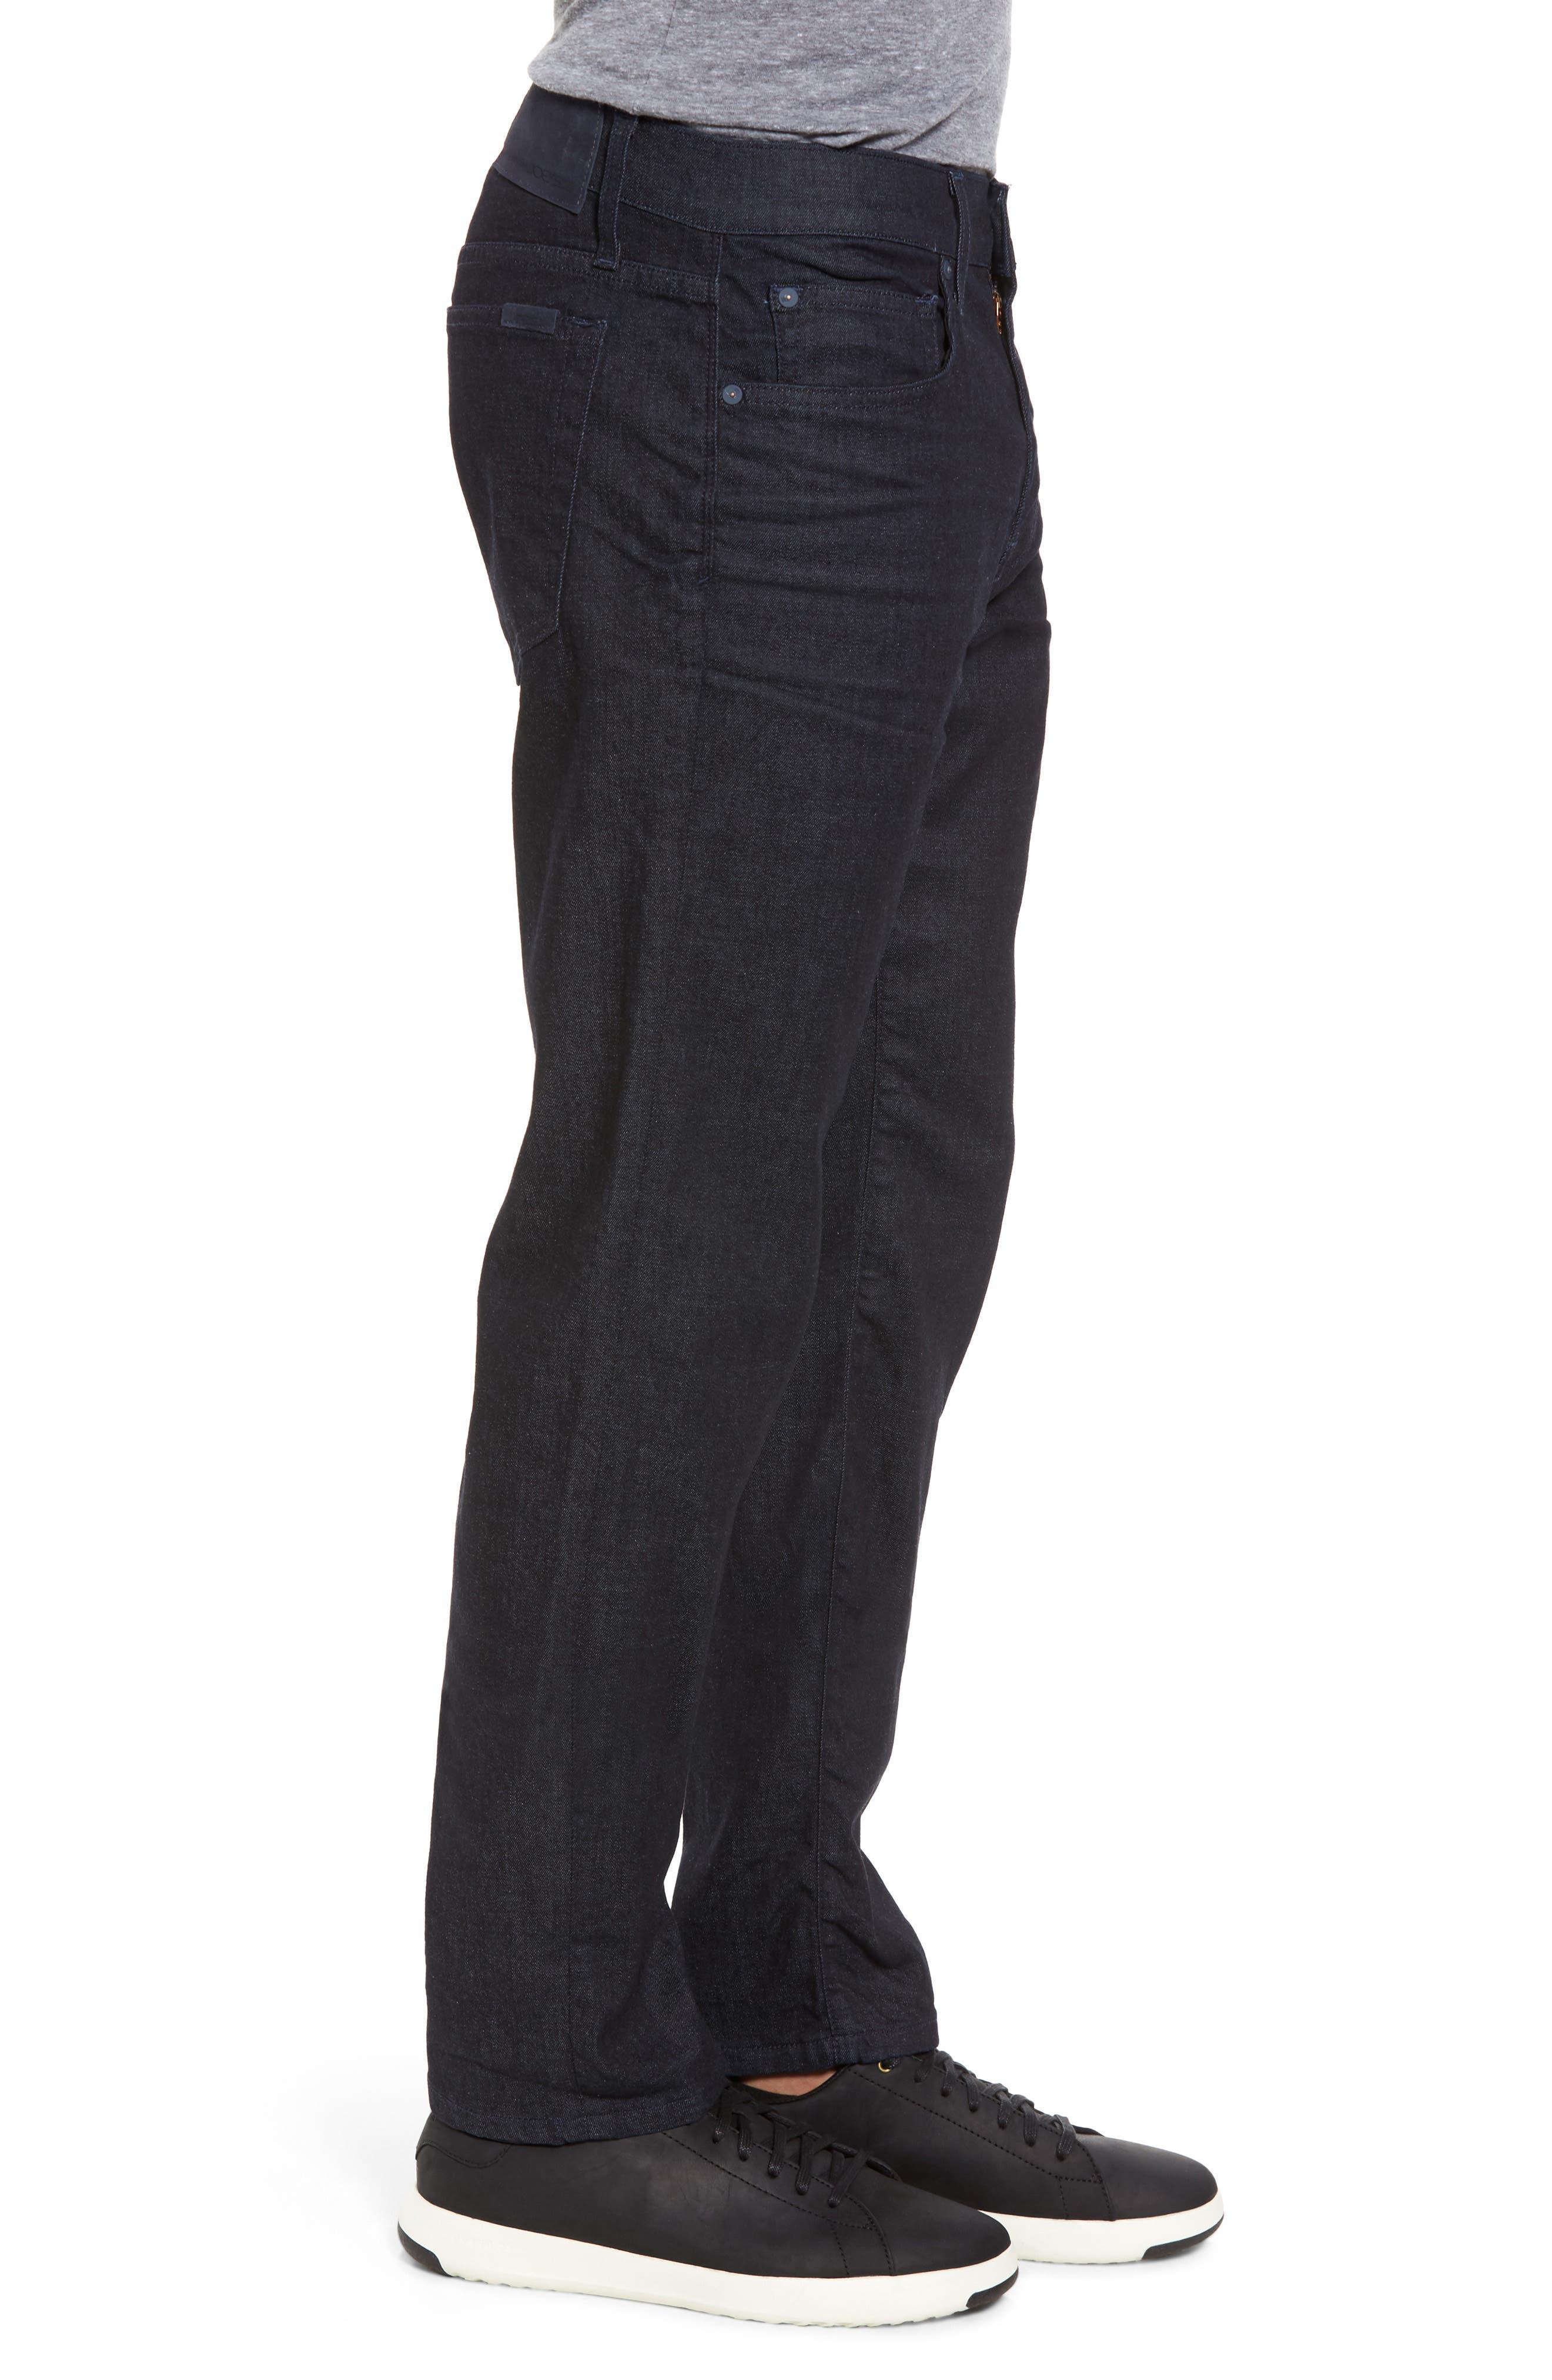 Brixton Slim Straight Fit Jeans,                             Alternate thumbnail 3, color,